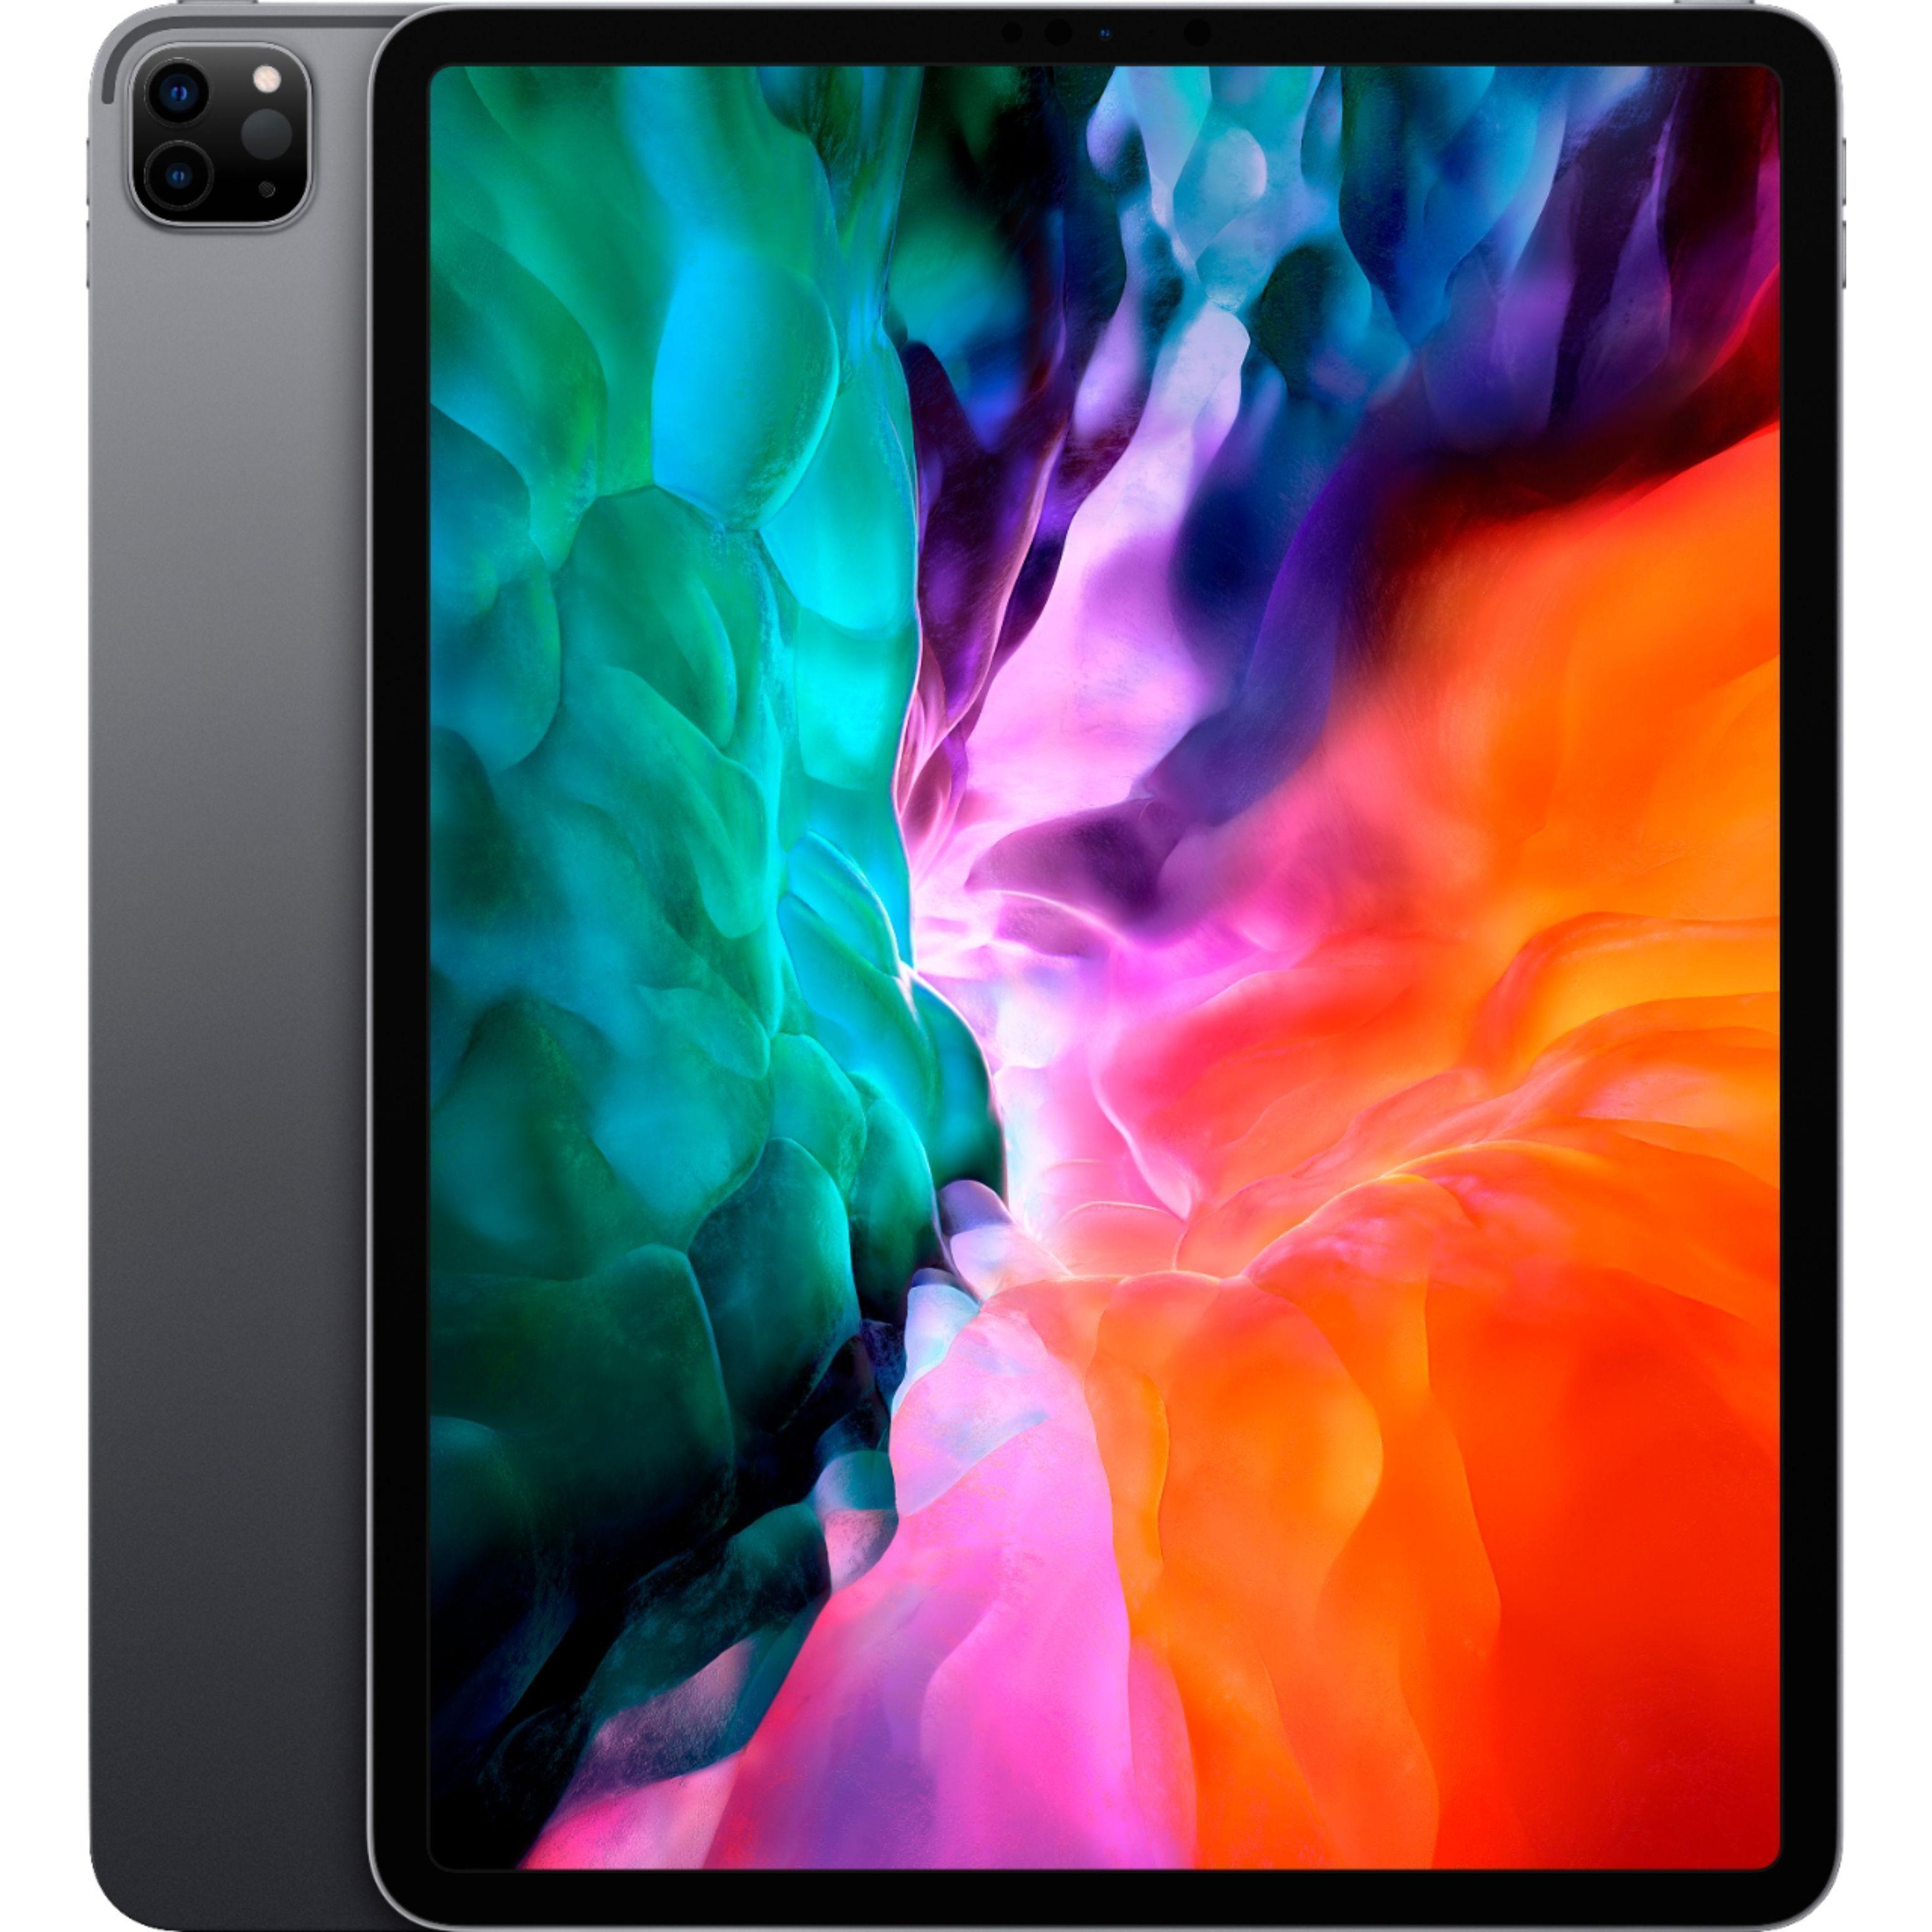 Ipad Pro 12 9 Inch 4th Gen March 2020 512gb Space Gray Wi Fi Apple Ipad Pro Ipad Pro 12 Apple Ipad